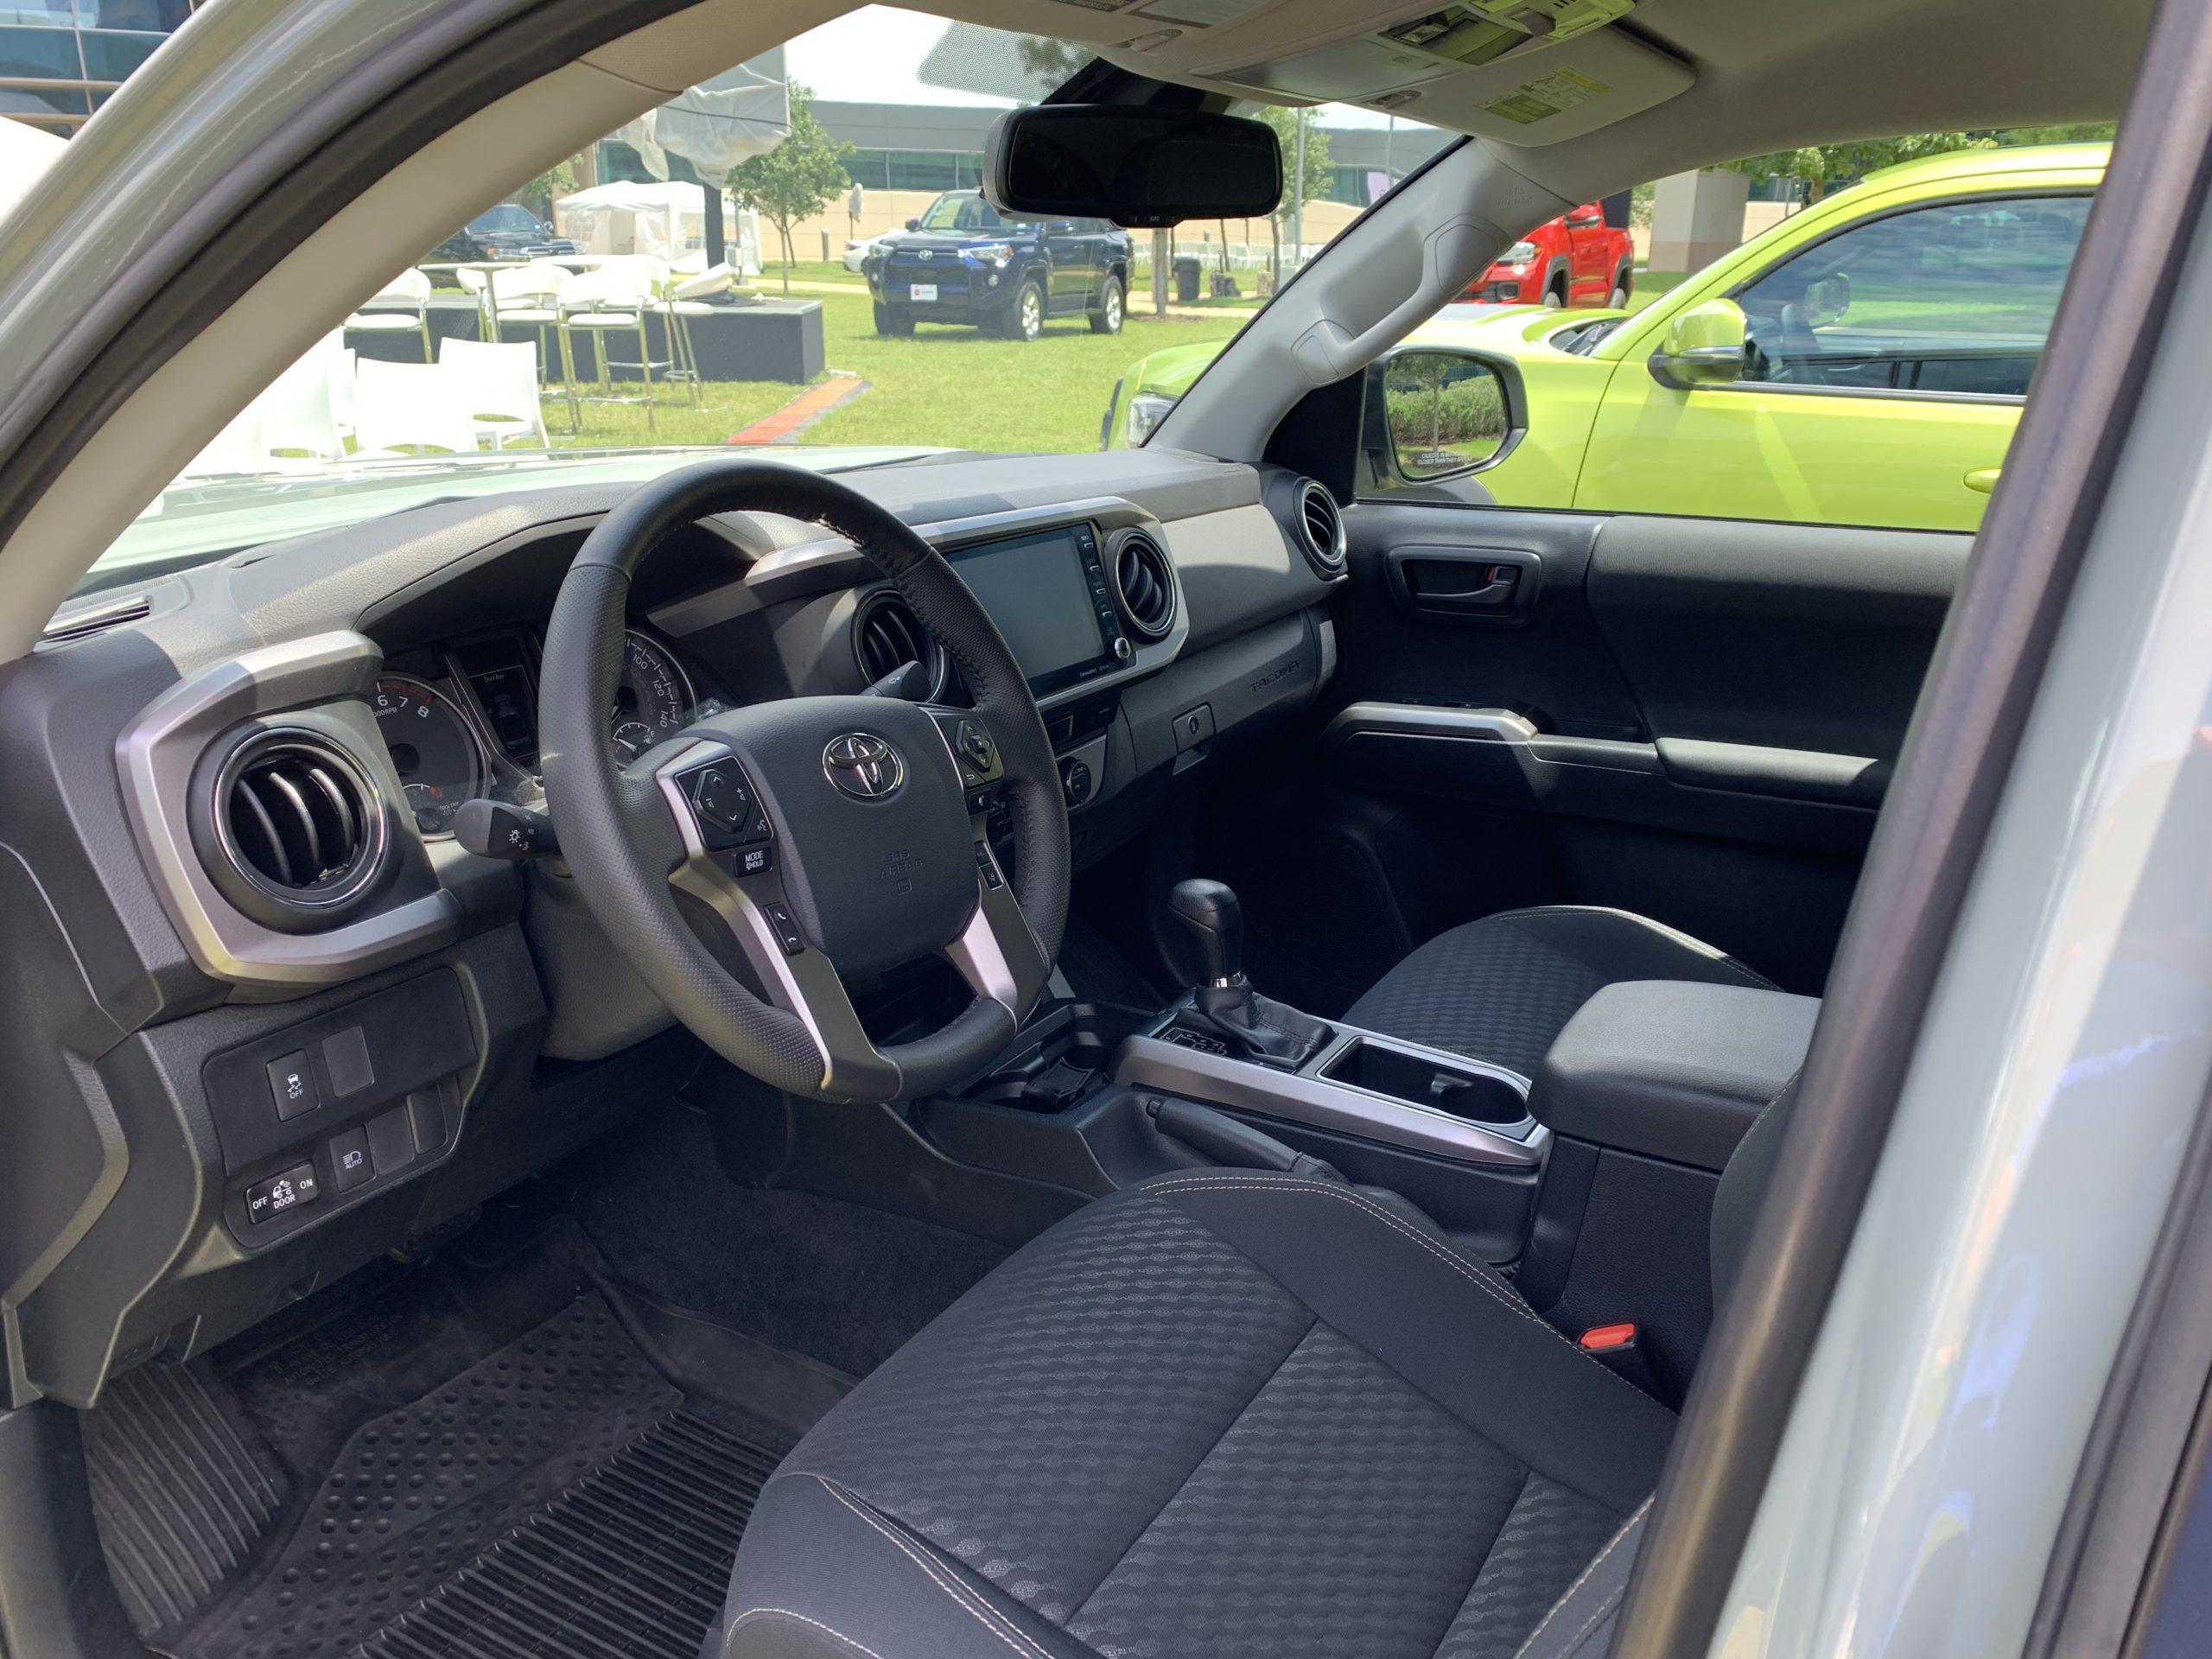 2022 Toyota Tacoma Trail Edition interior